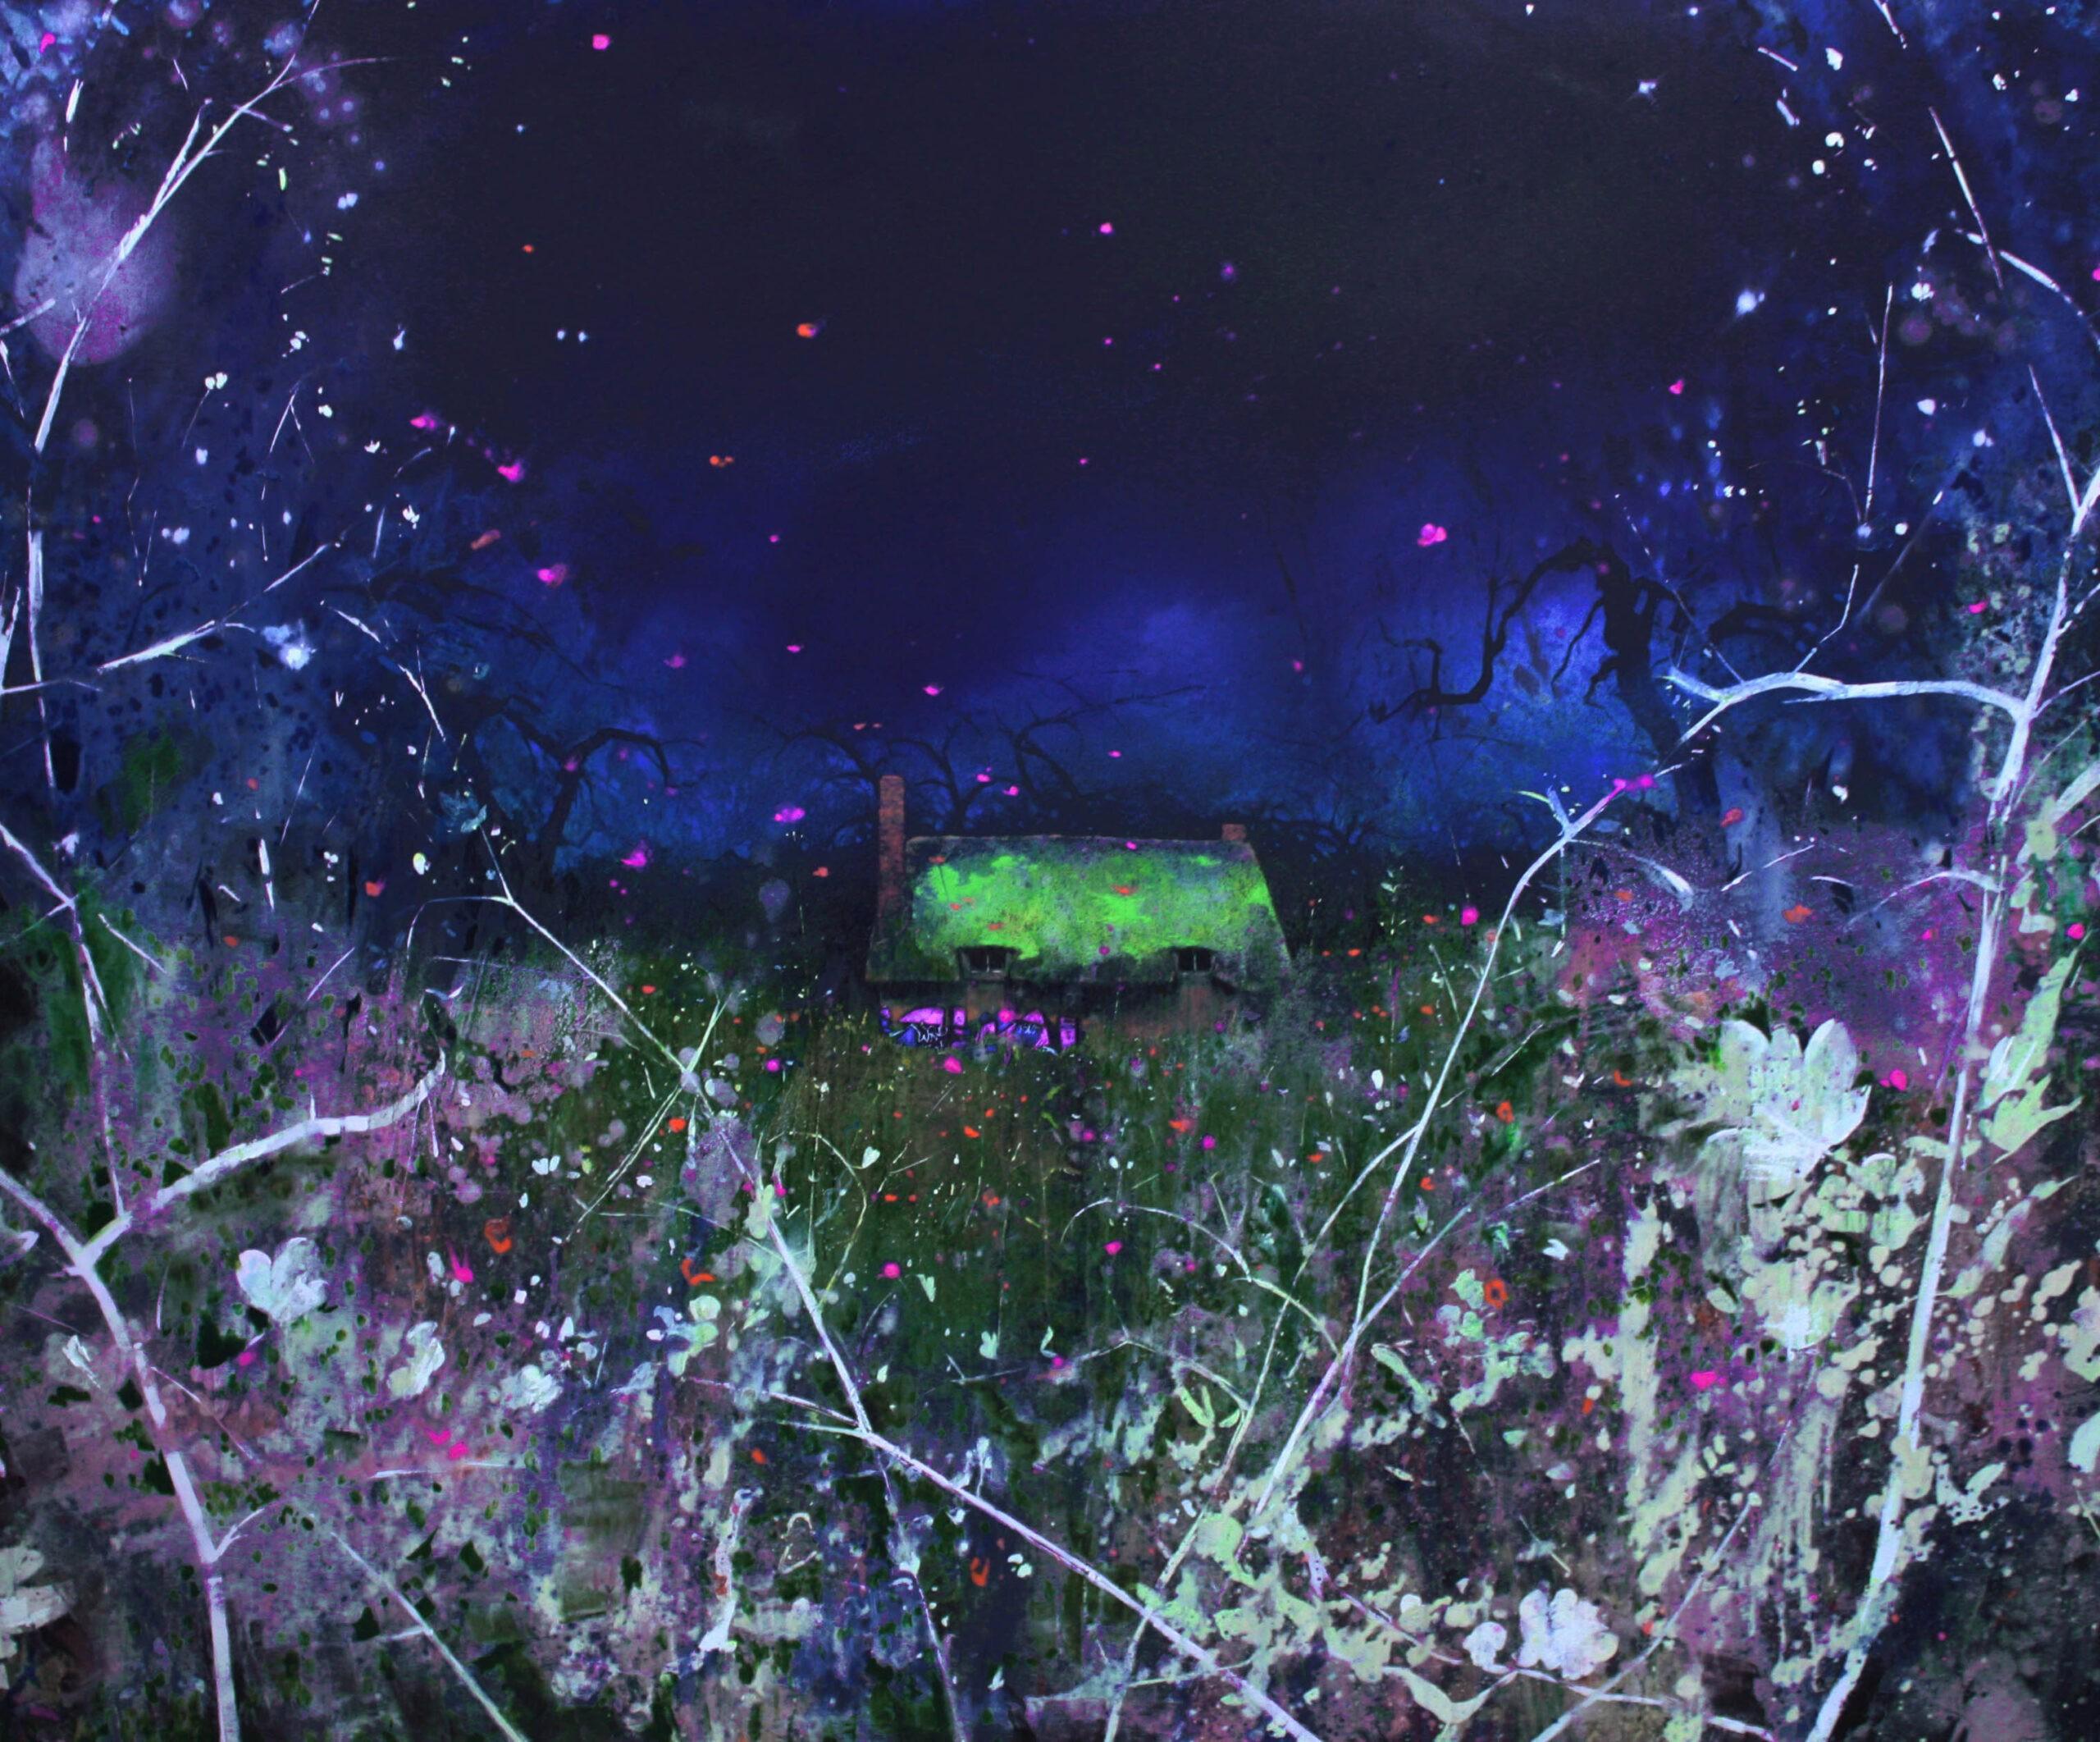 Lume 152 x 183 cm oil on canvas